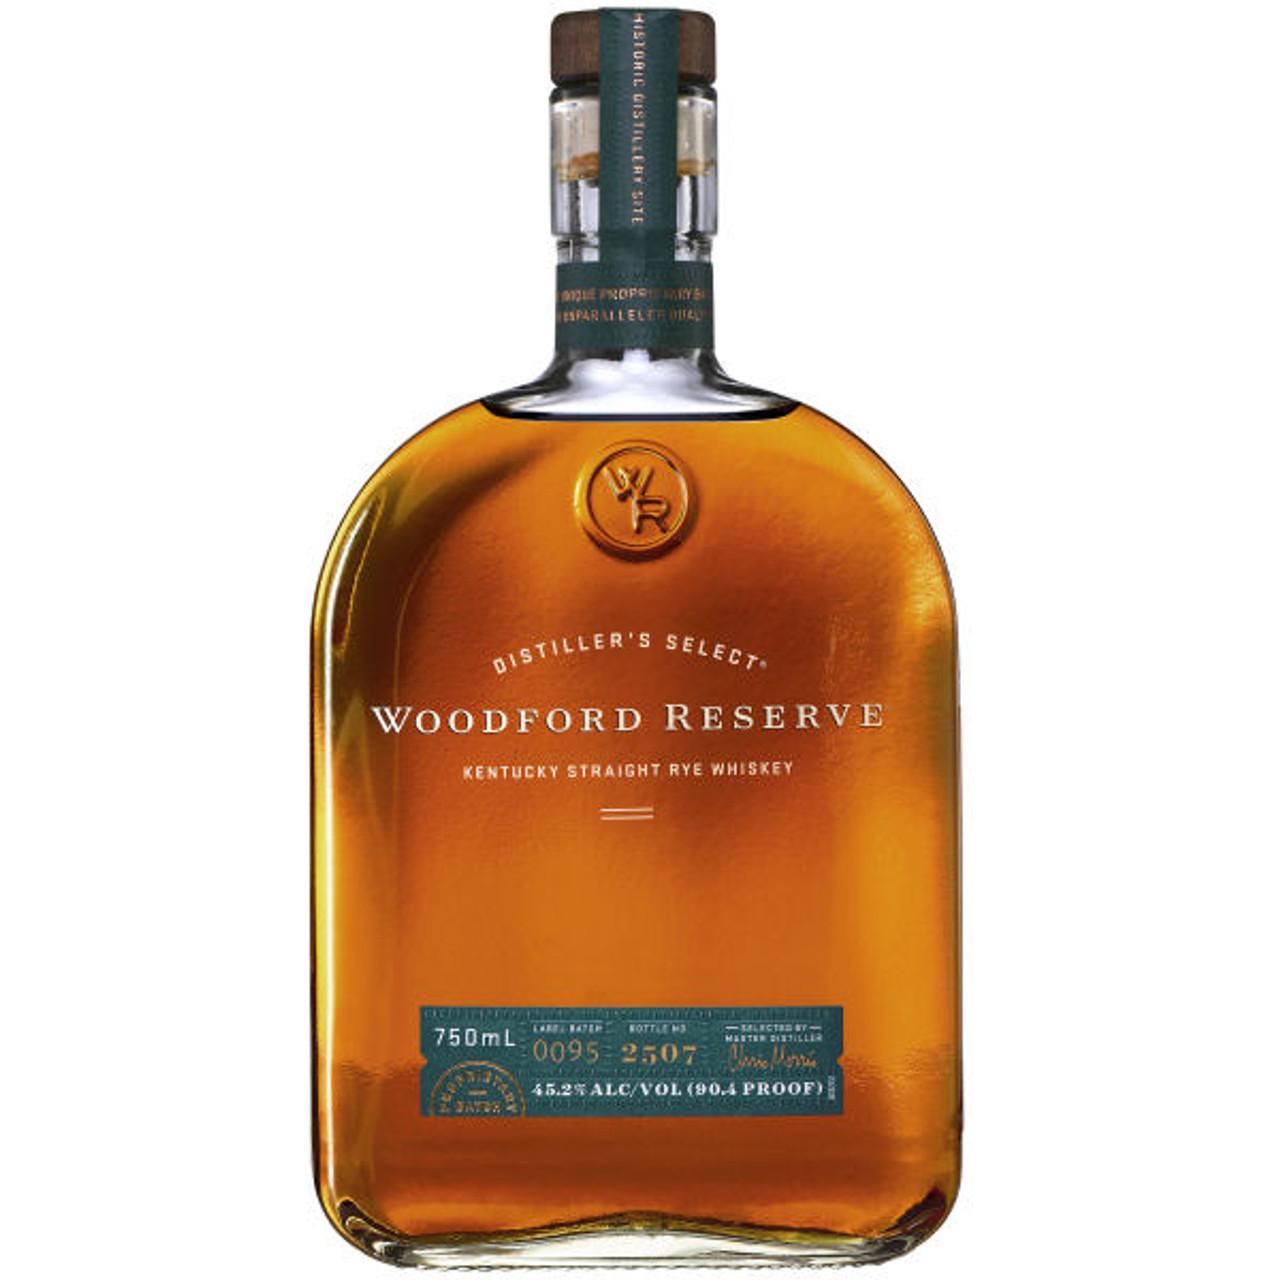 Woodford Reserve Kentucky Straight Rye Whiskey 750ml